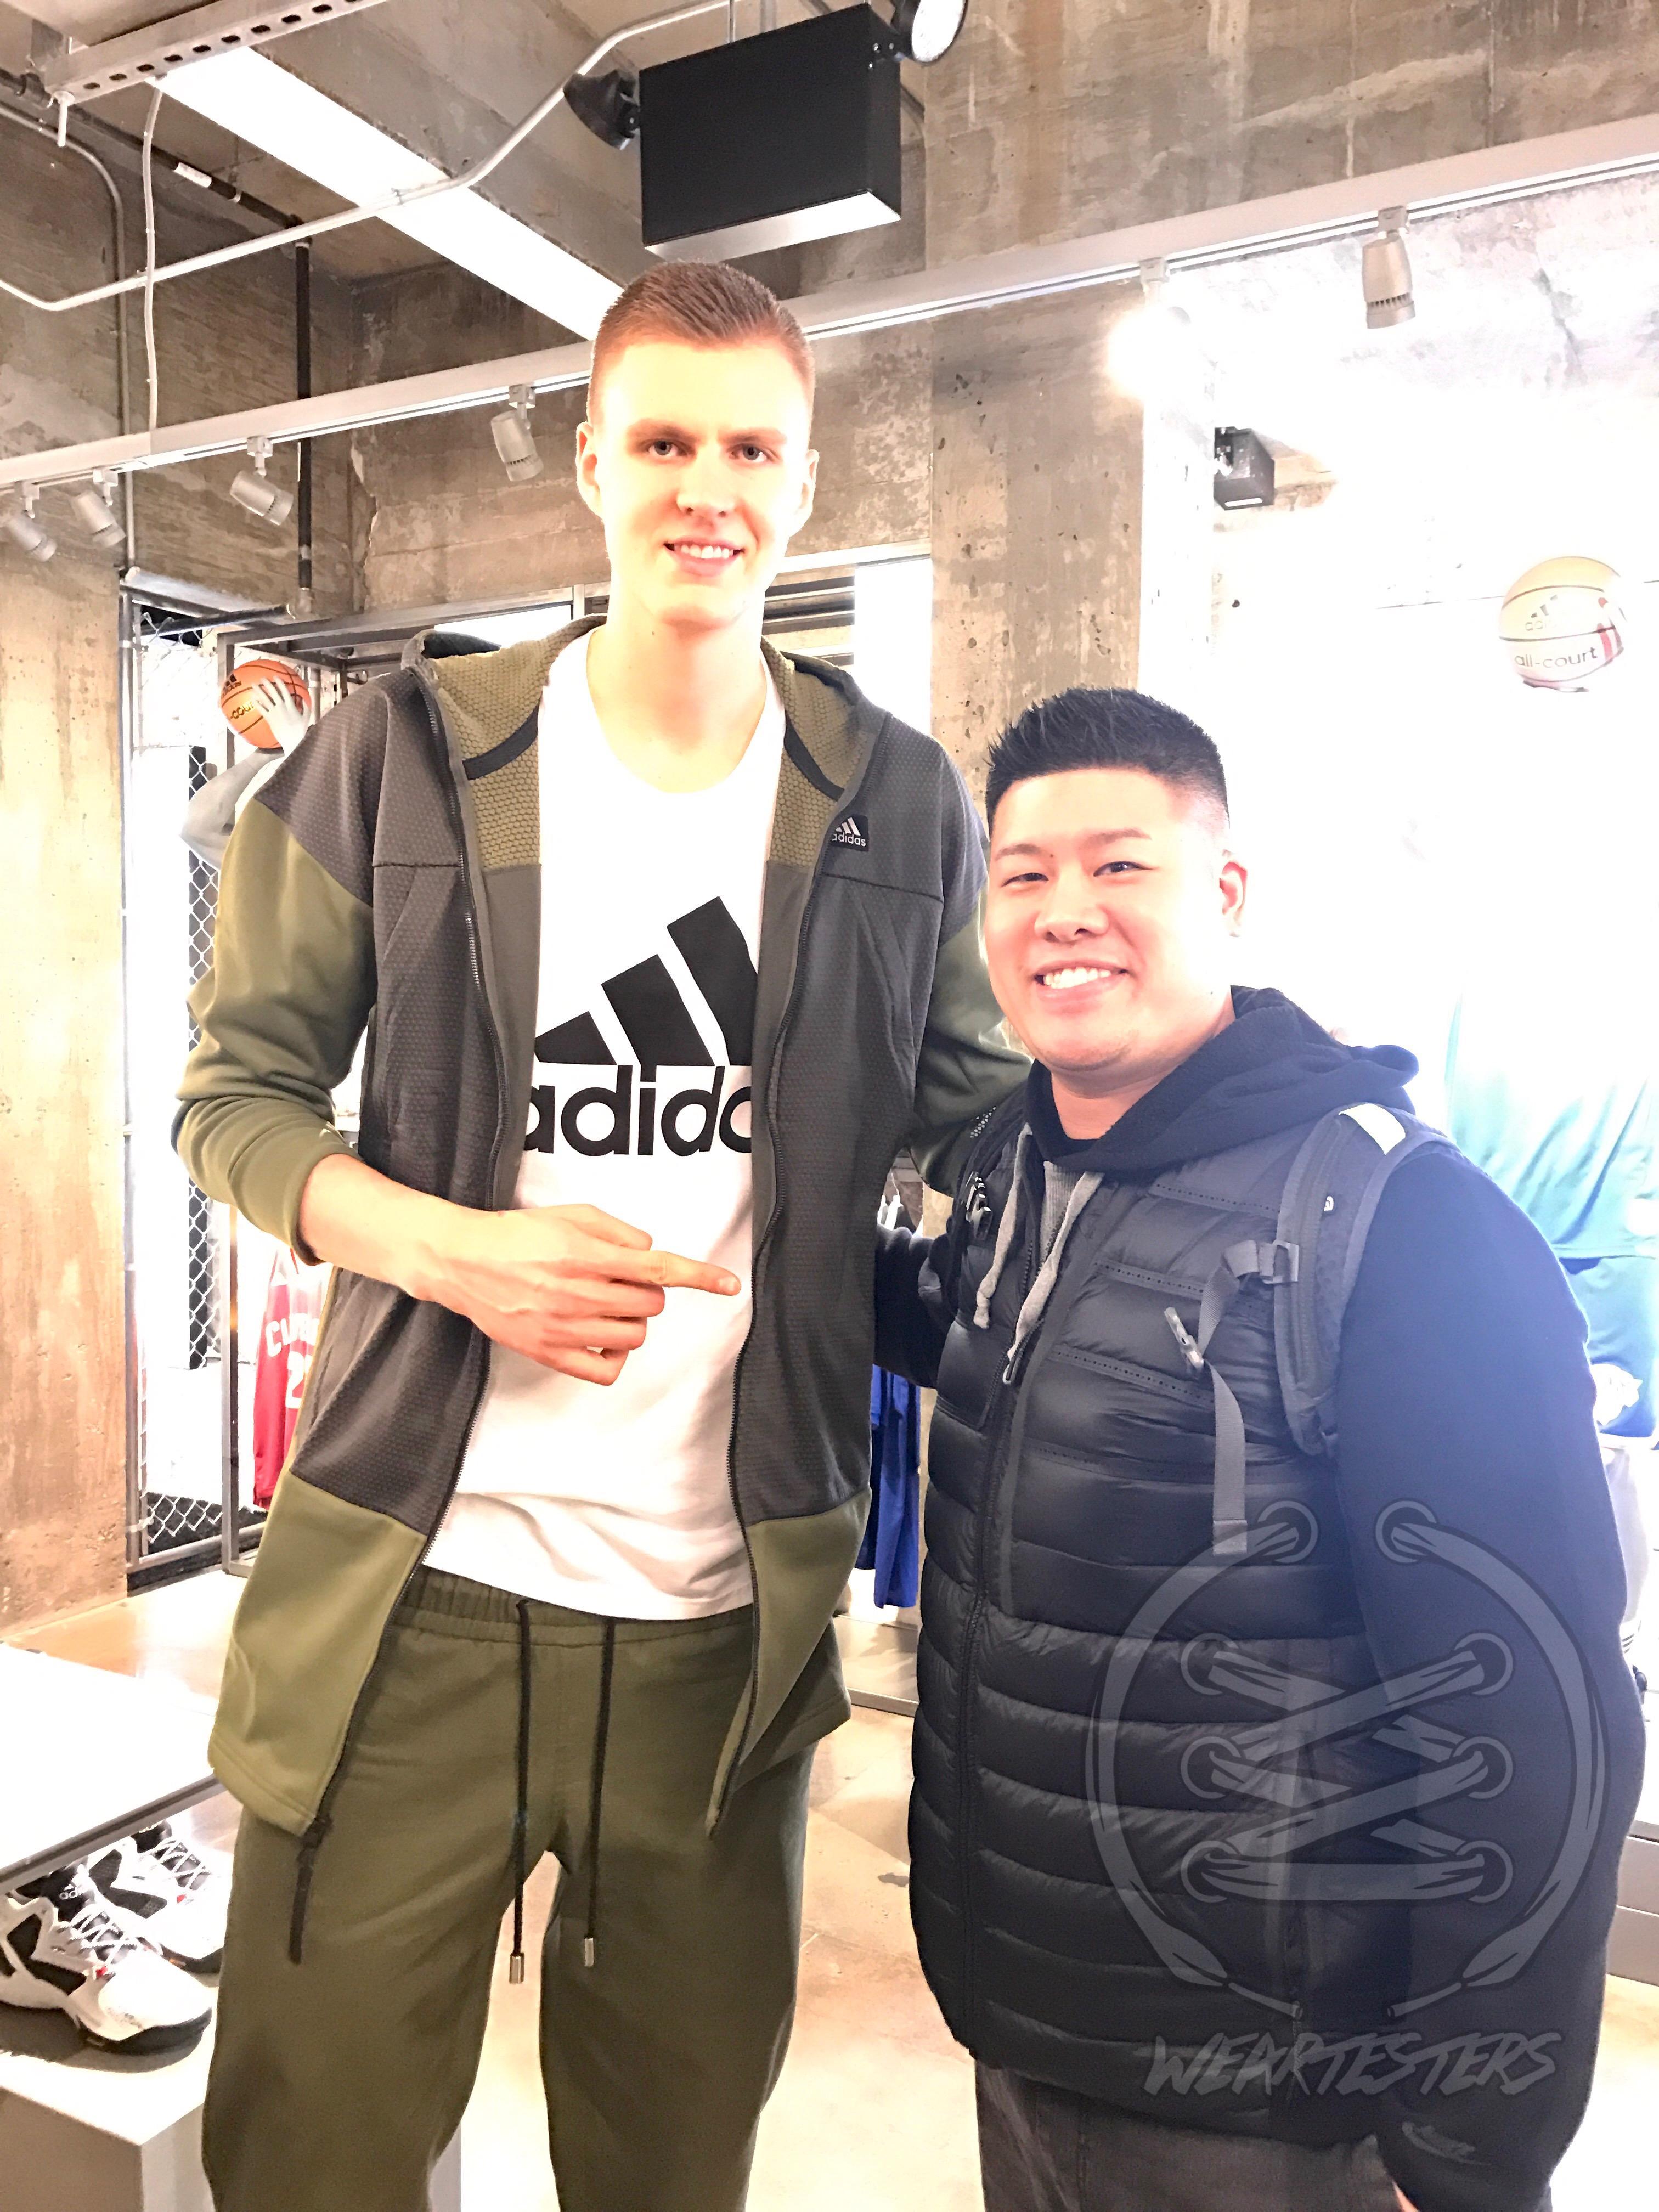 Adidas NYC - Kristaps Porgingis and NYJumpman23